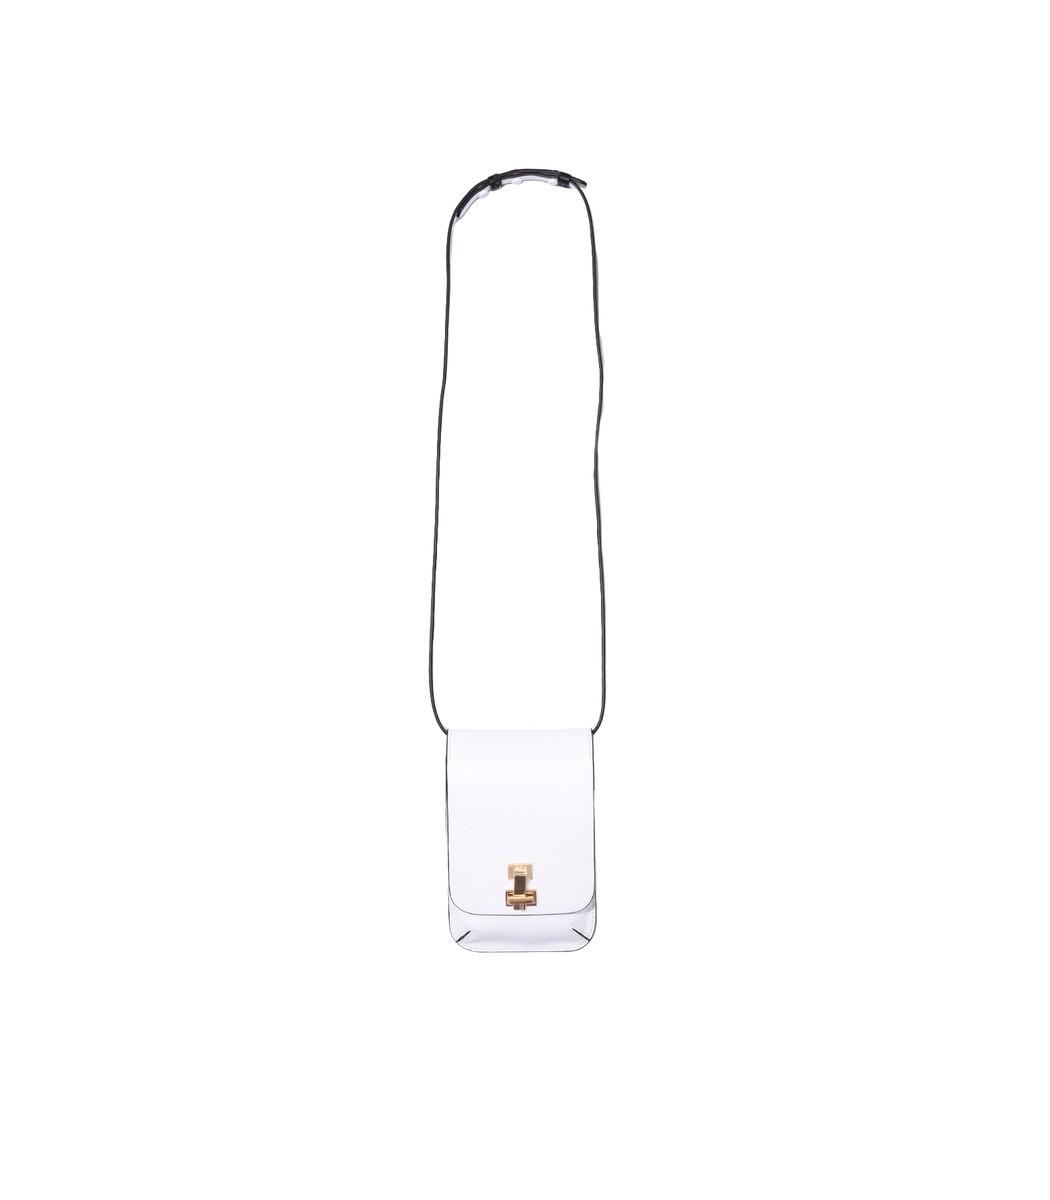 EZ Mini Bag in Off White